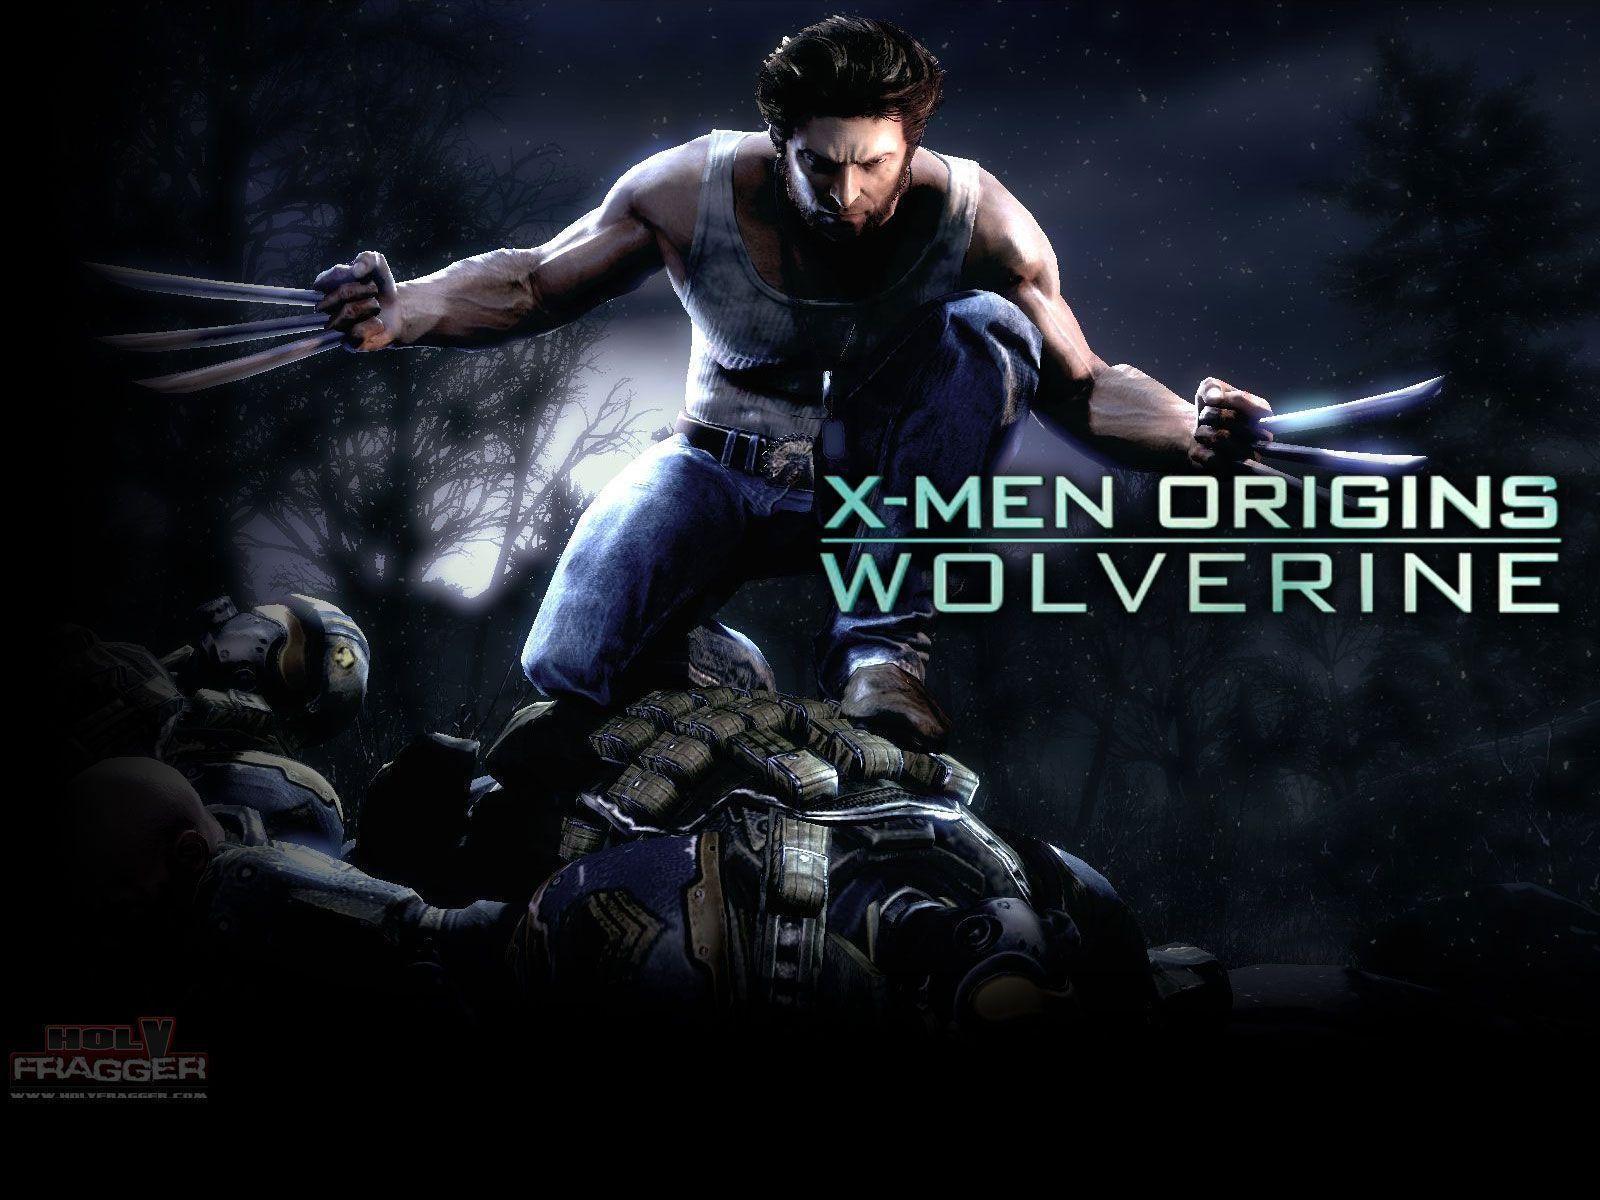 Free Xman Games